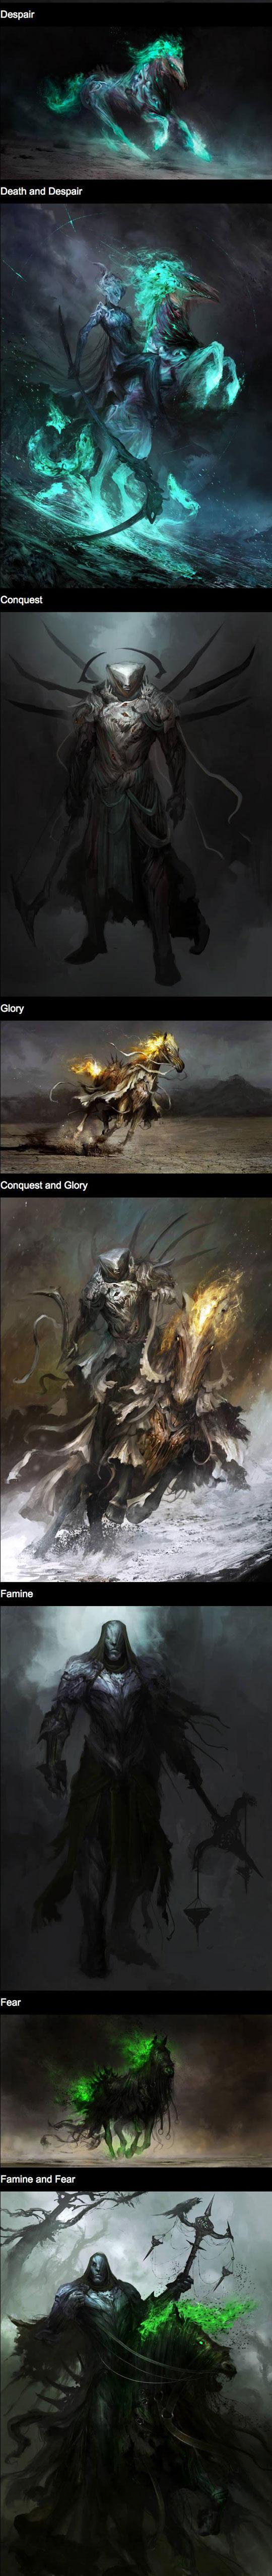 cool-drawing-Horseman-Apocalypse-War-Death